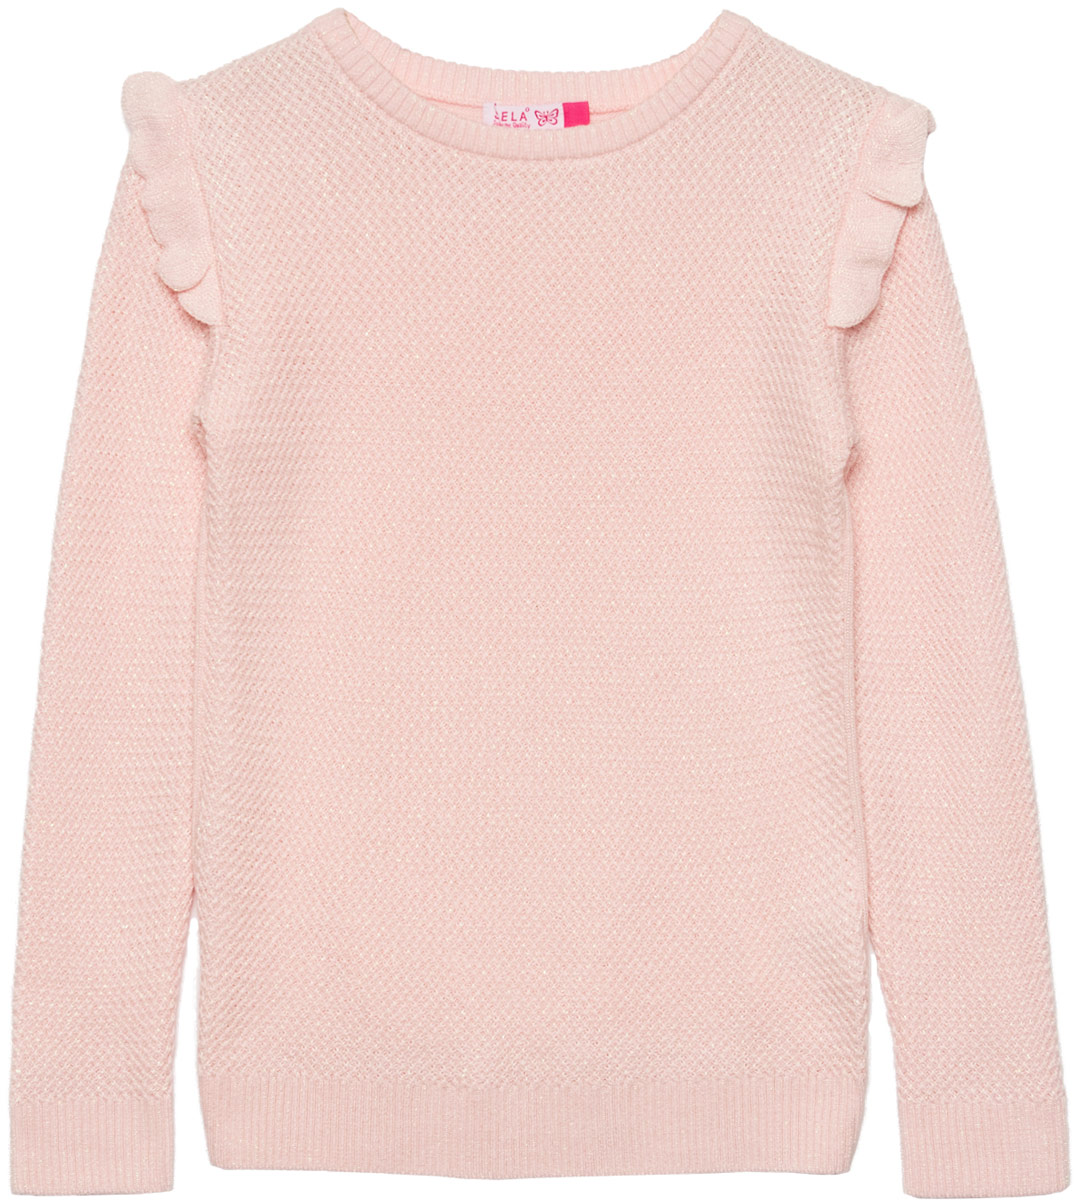 Джемпер для девочки Sela, цвет: розовый. JR-614/971-8110. Размер 152 цена